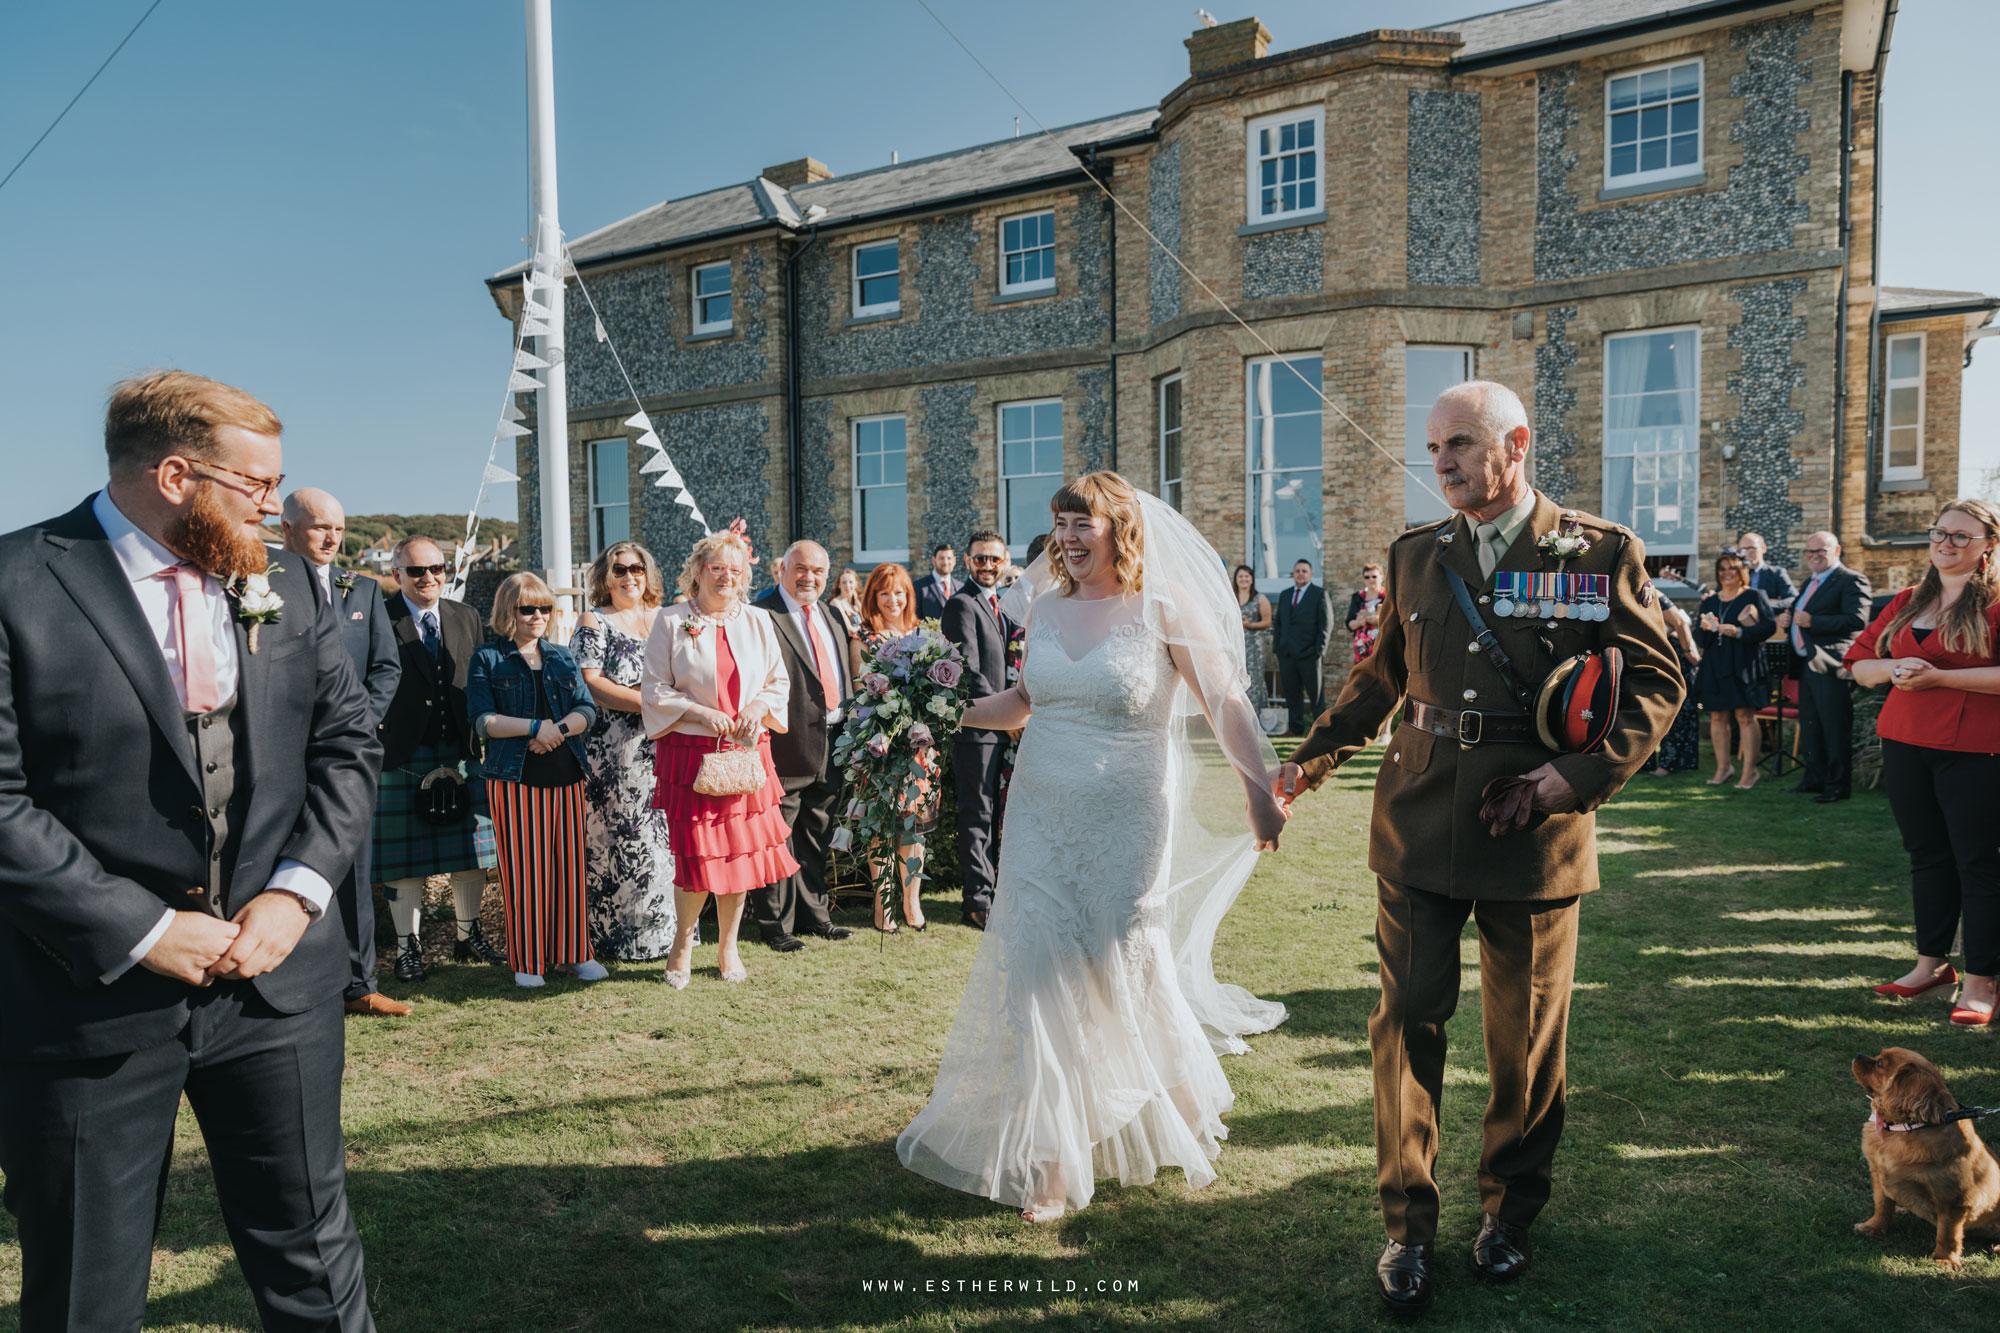 Cromer_Wedding_Beach_Outdoor_Ceremony_Norfolk_North_Lodge_Registry_Office_Rocket_House_Cafe_Cromer_Pier_IMG_3700.jpg